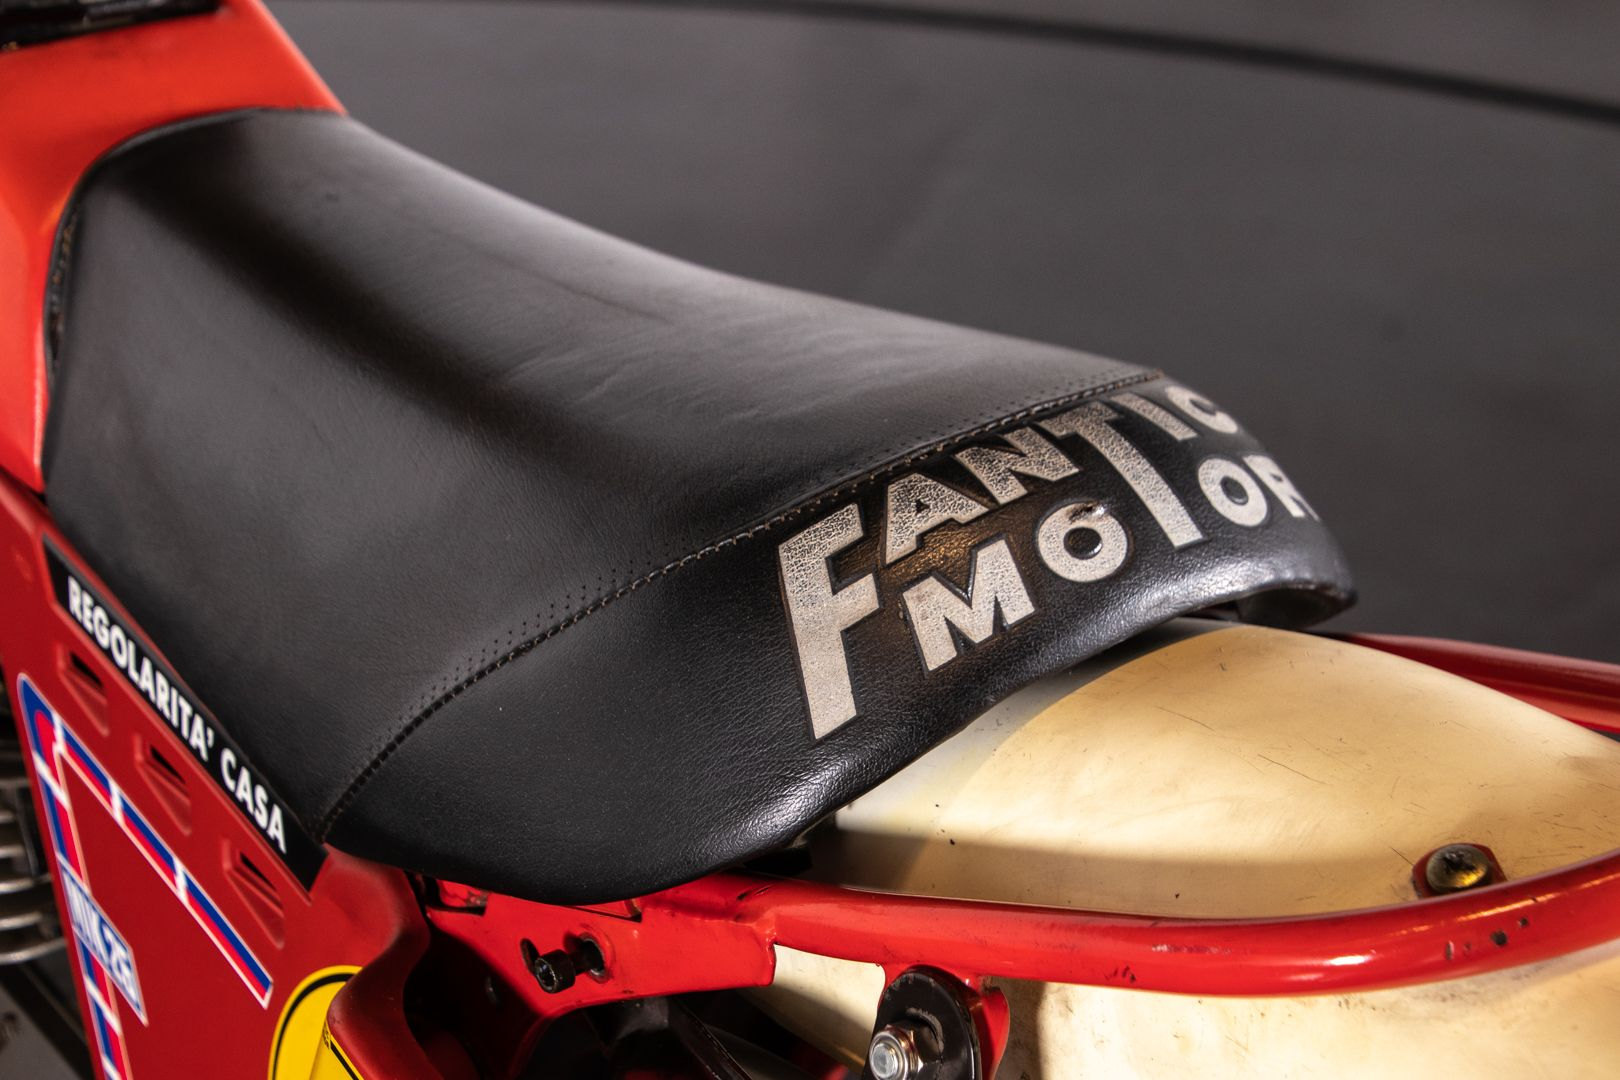 2000 FANTIC MOTOR TX 190 48872